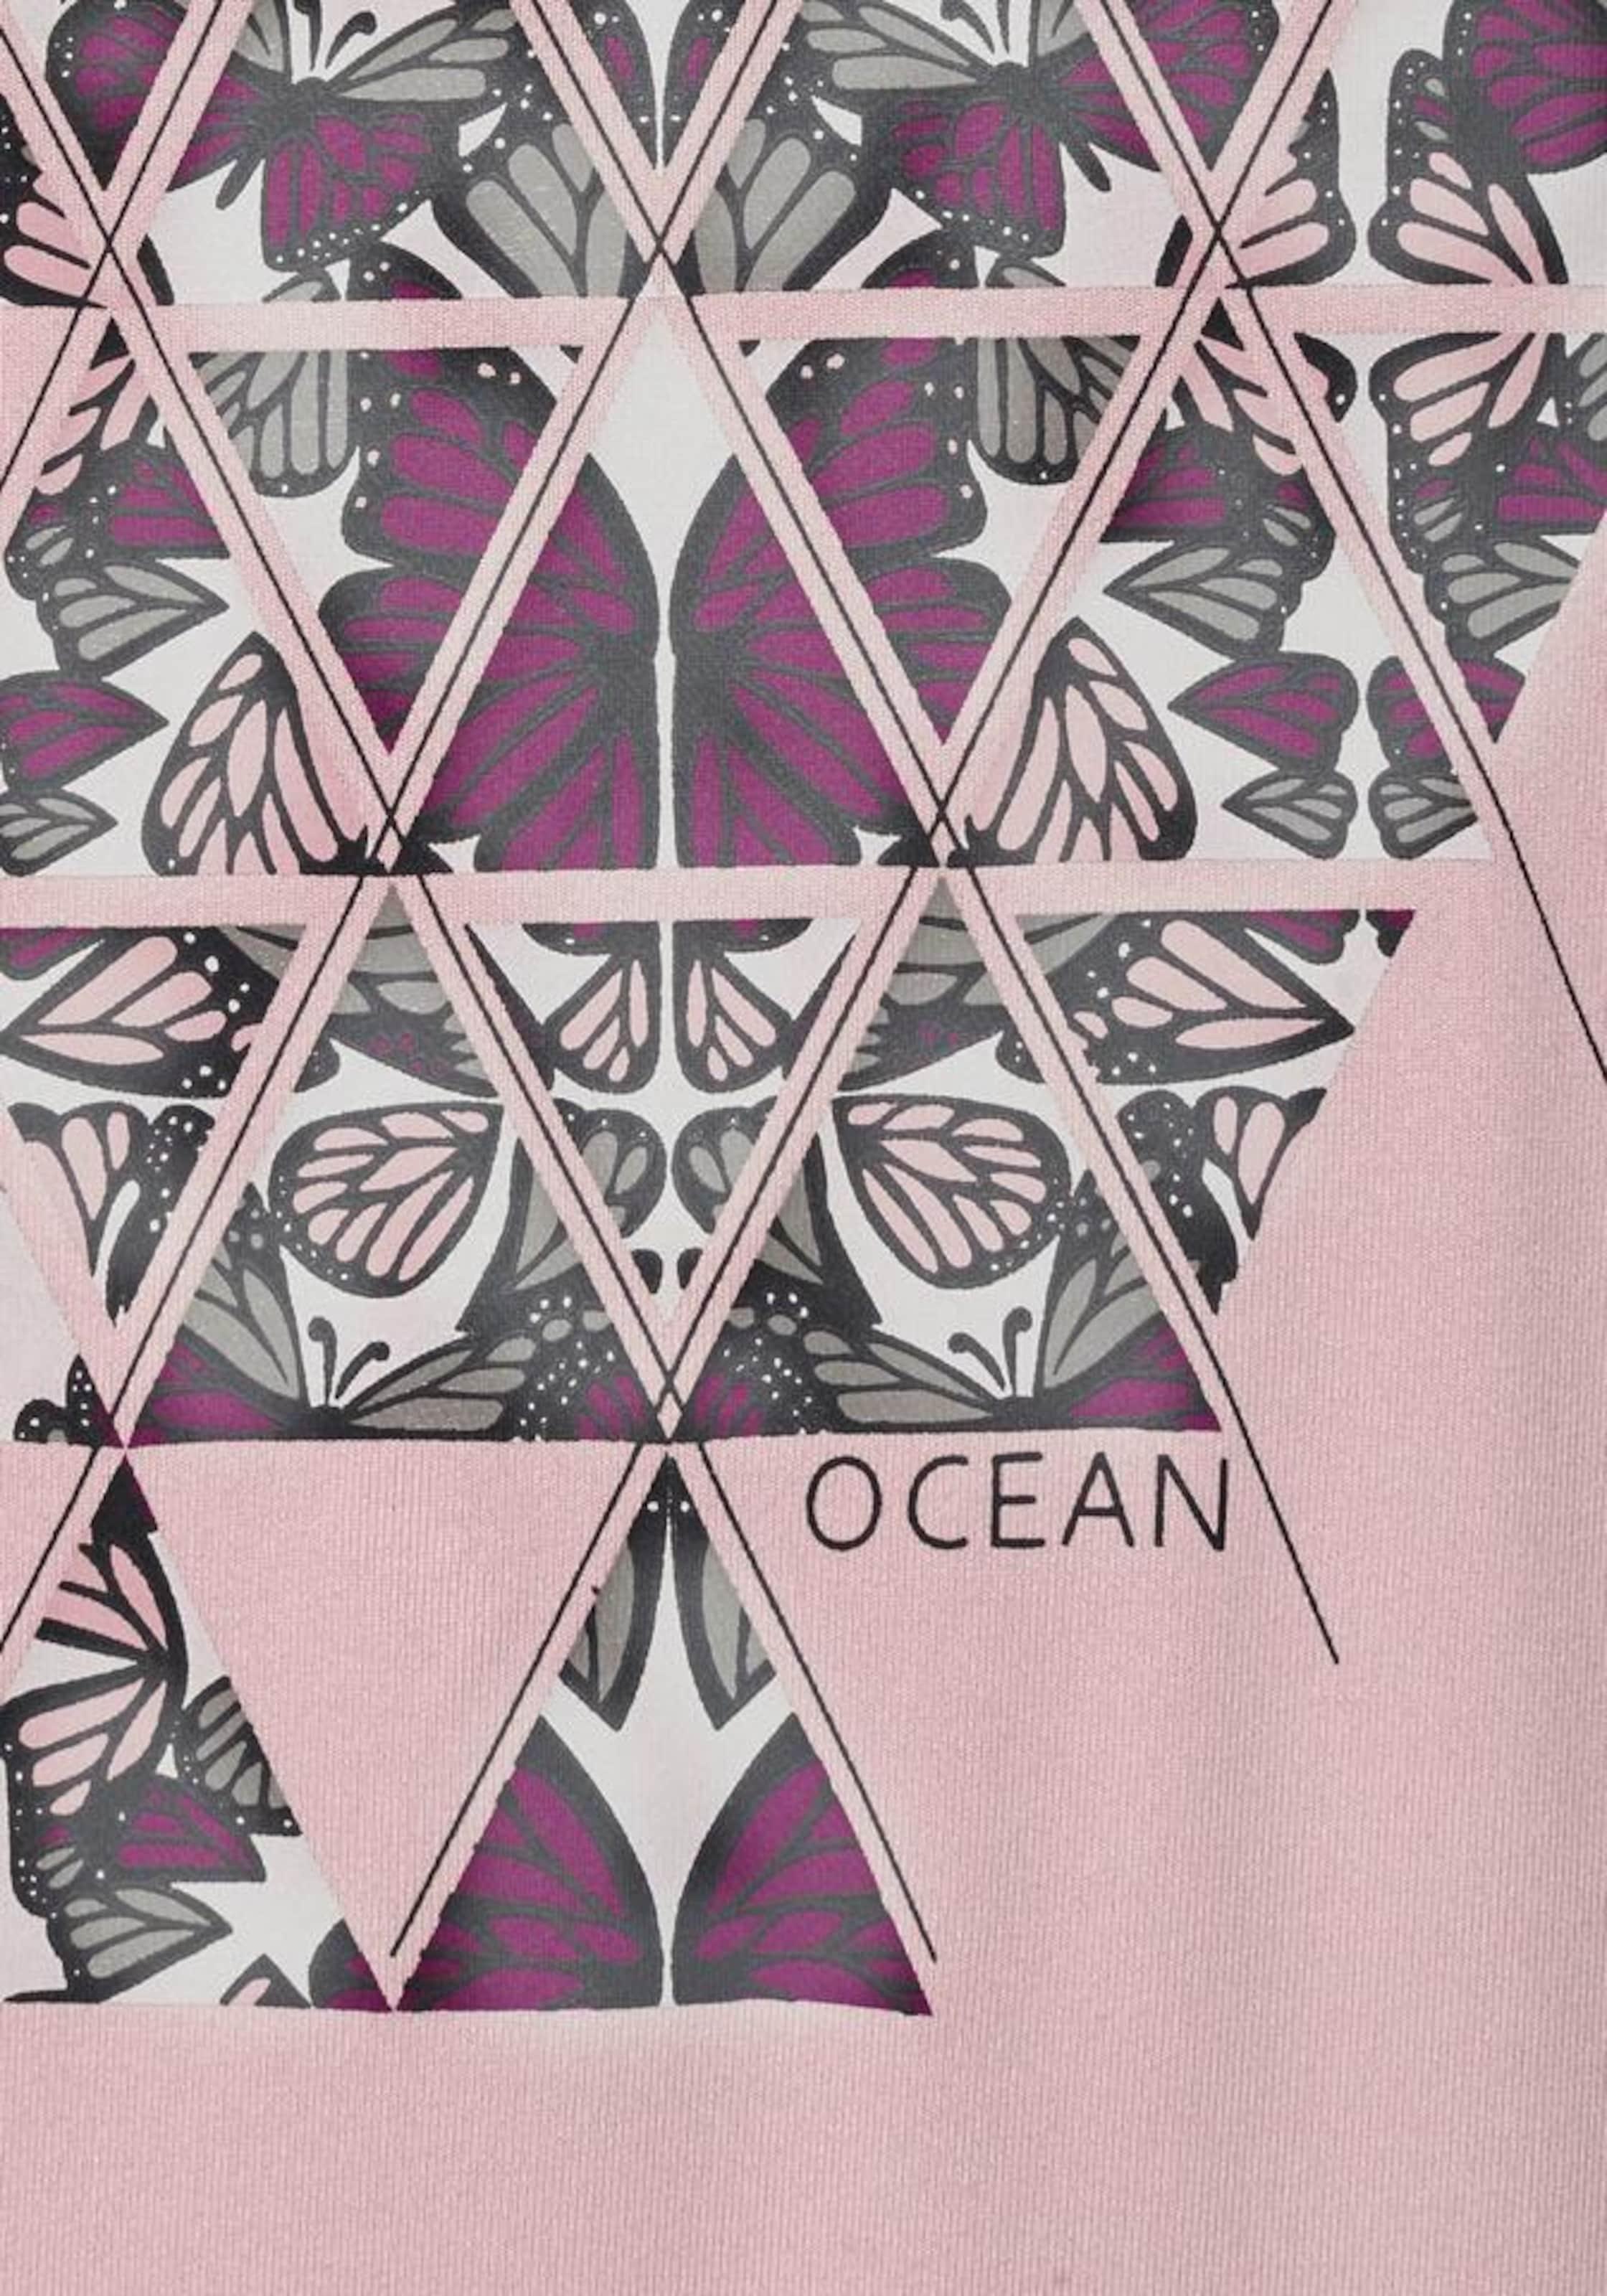 Shirt In Ocean Rotviolett Schwarz KhakiPastellgrün Altrosa Sportswear b7fYgy6